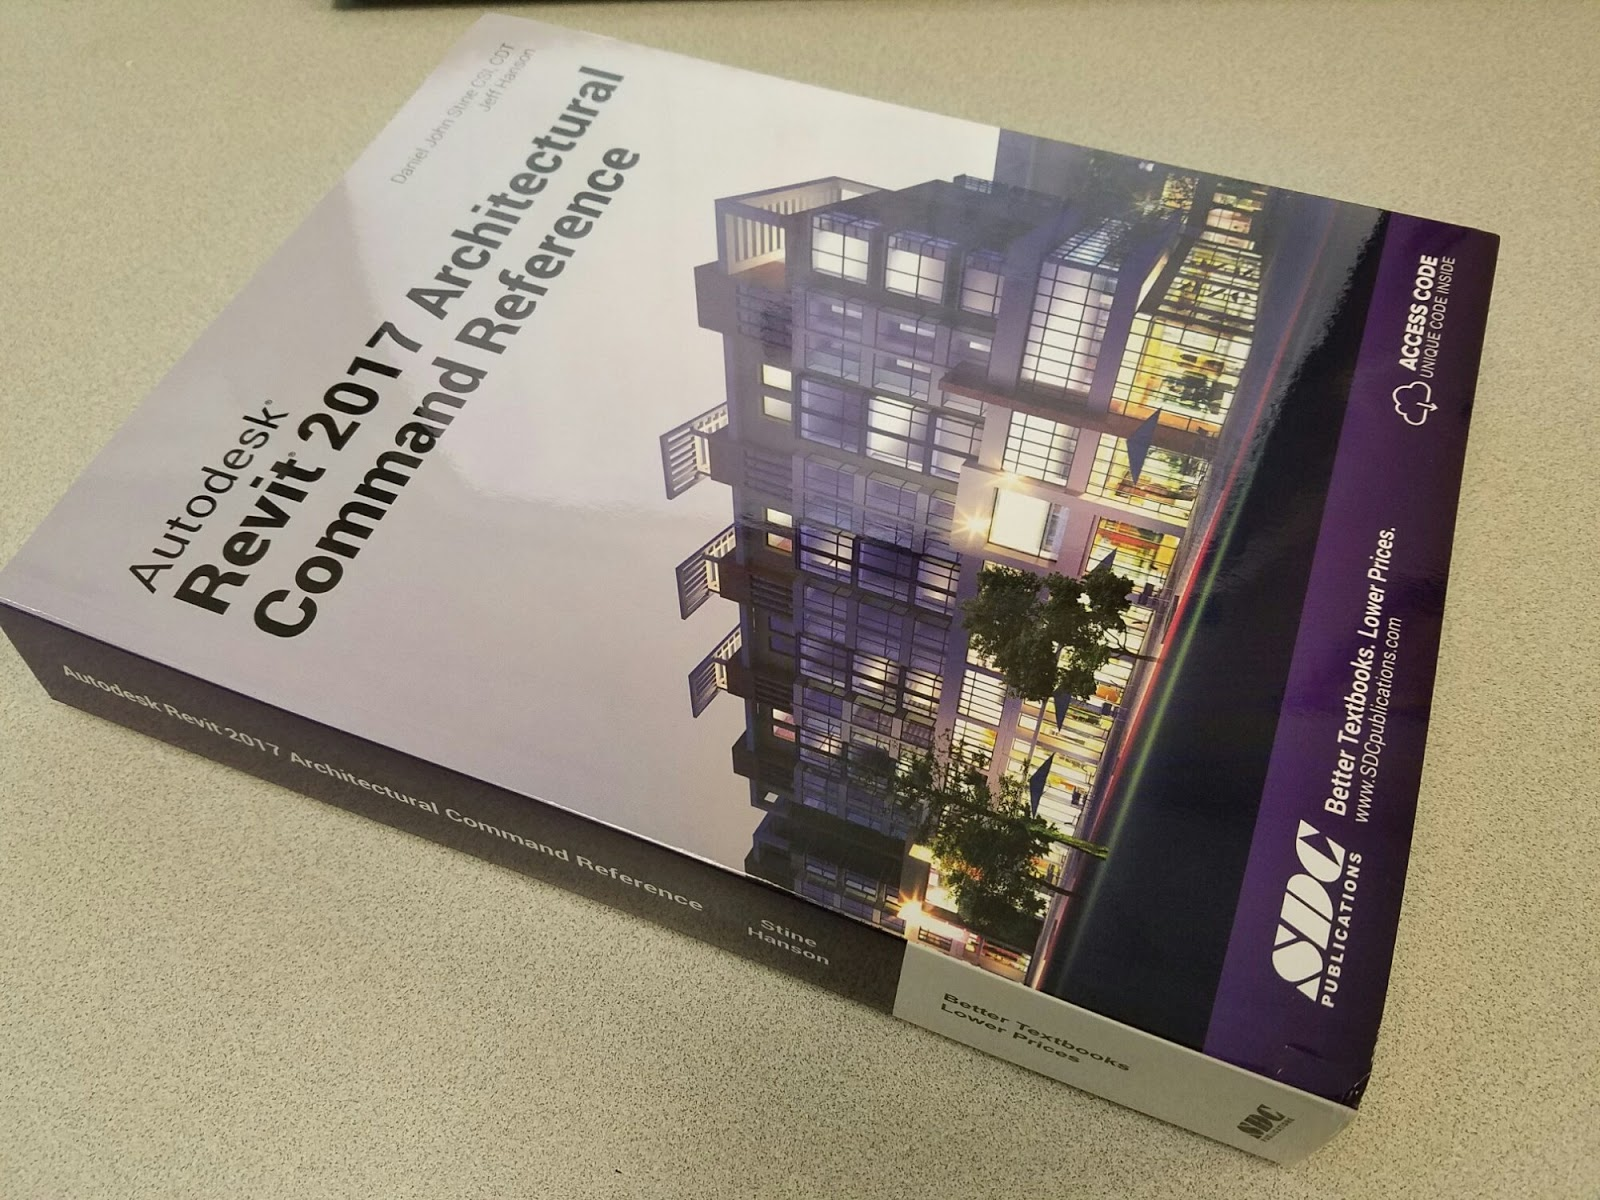 BIM Chapters New Book Autodesk Revit 2017 Architectural Command